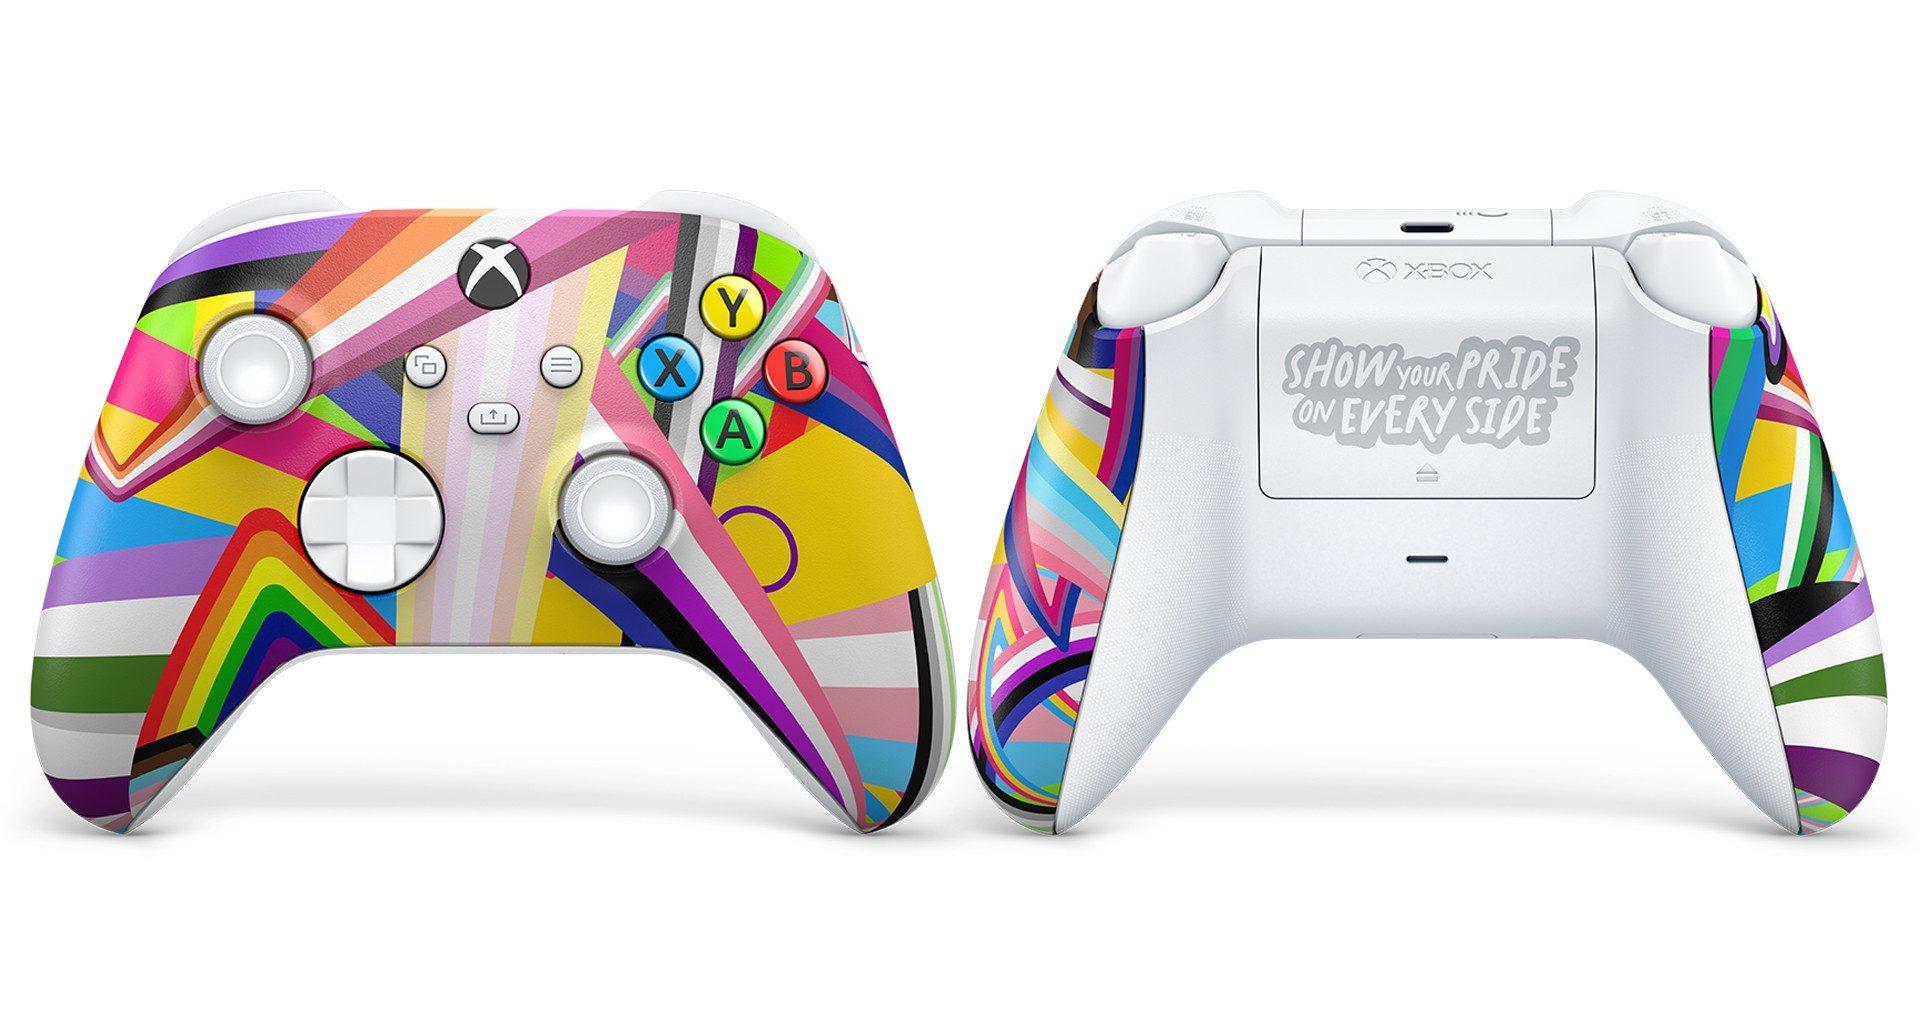 Xbox Pride Controller